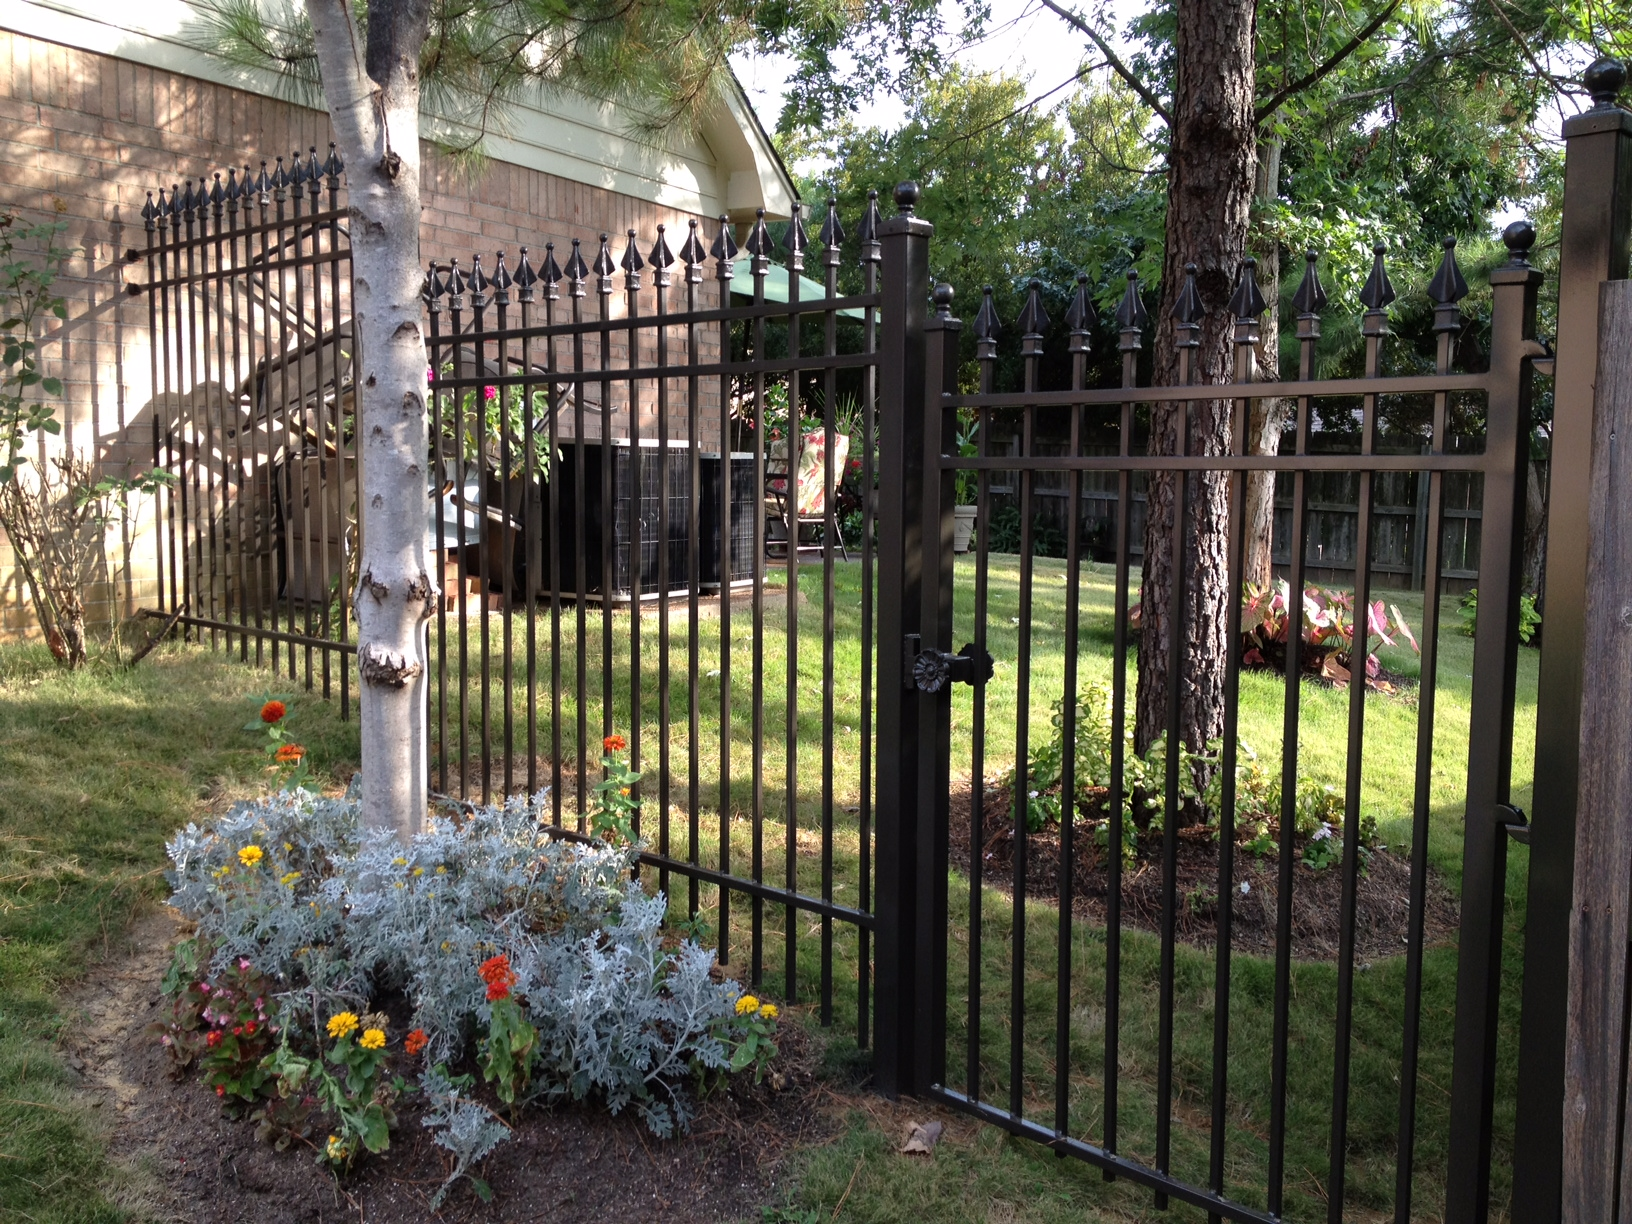 Stepped Fence 2.JPG